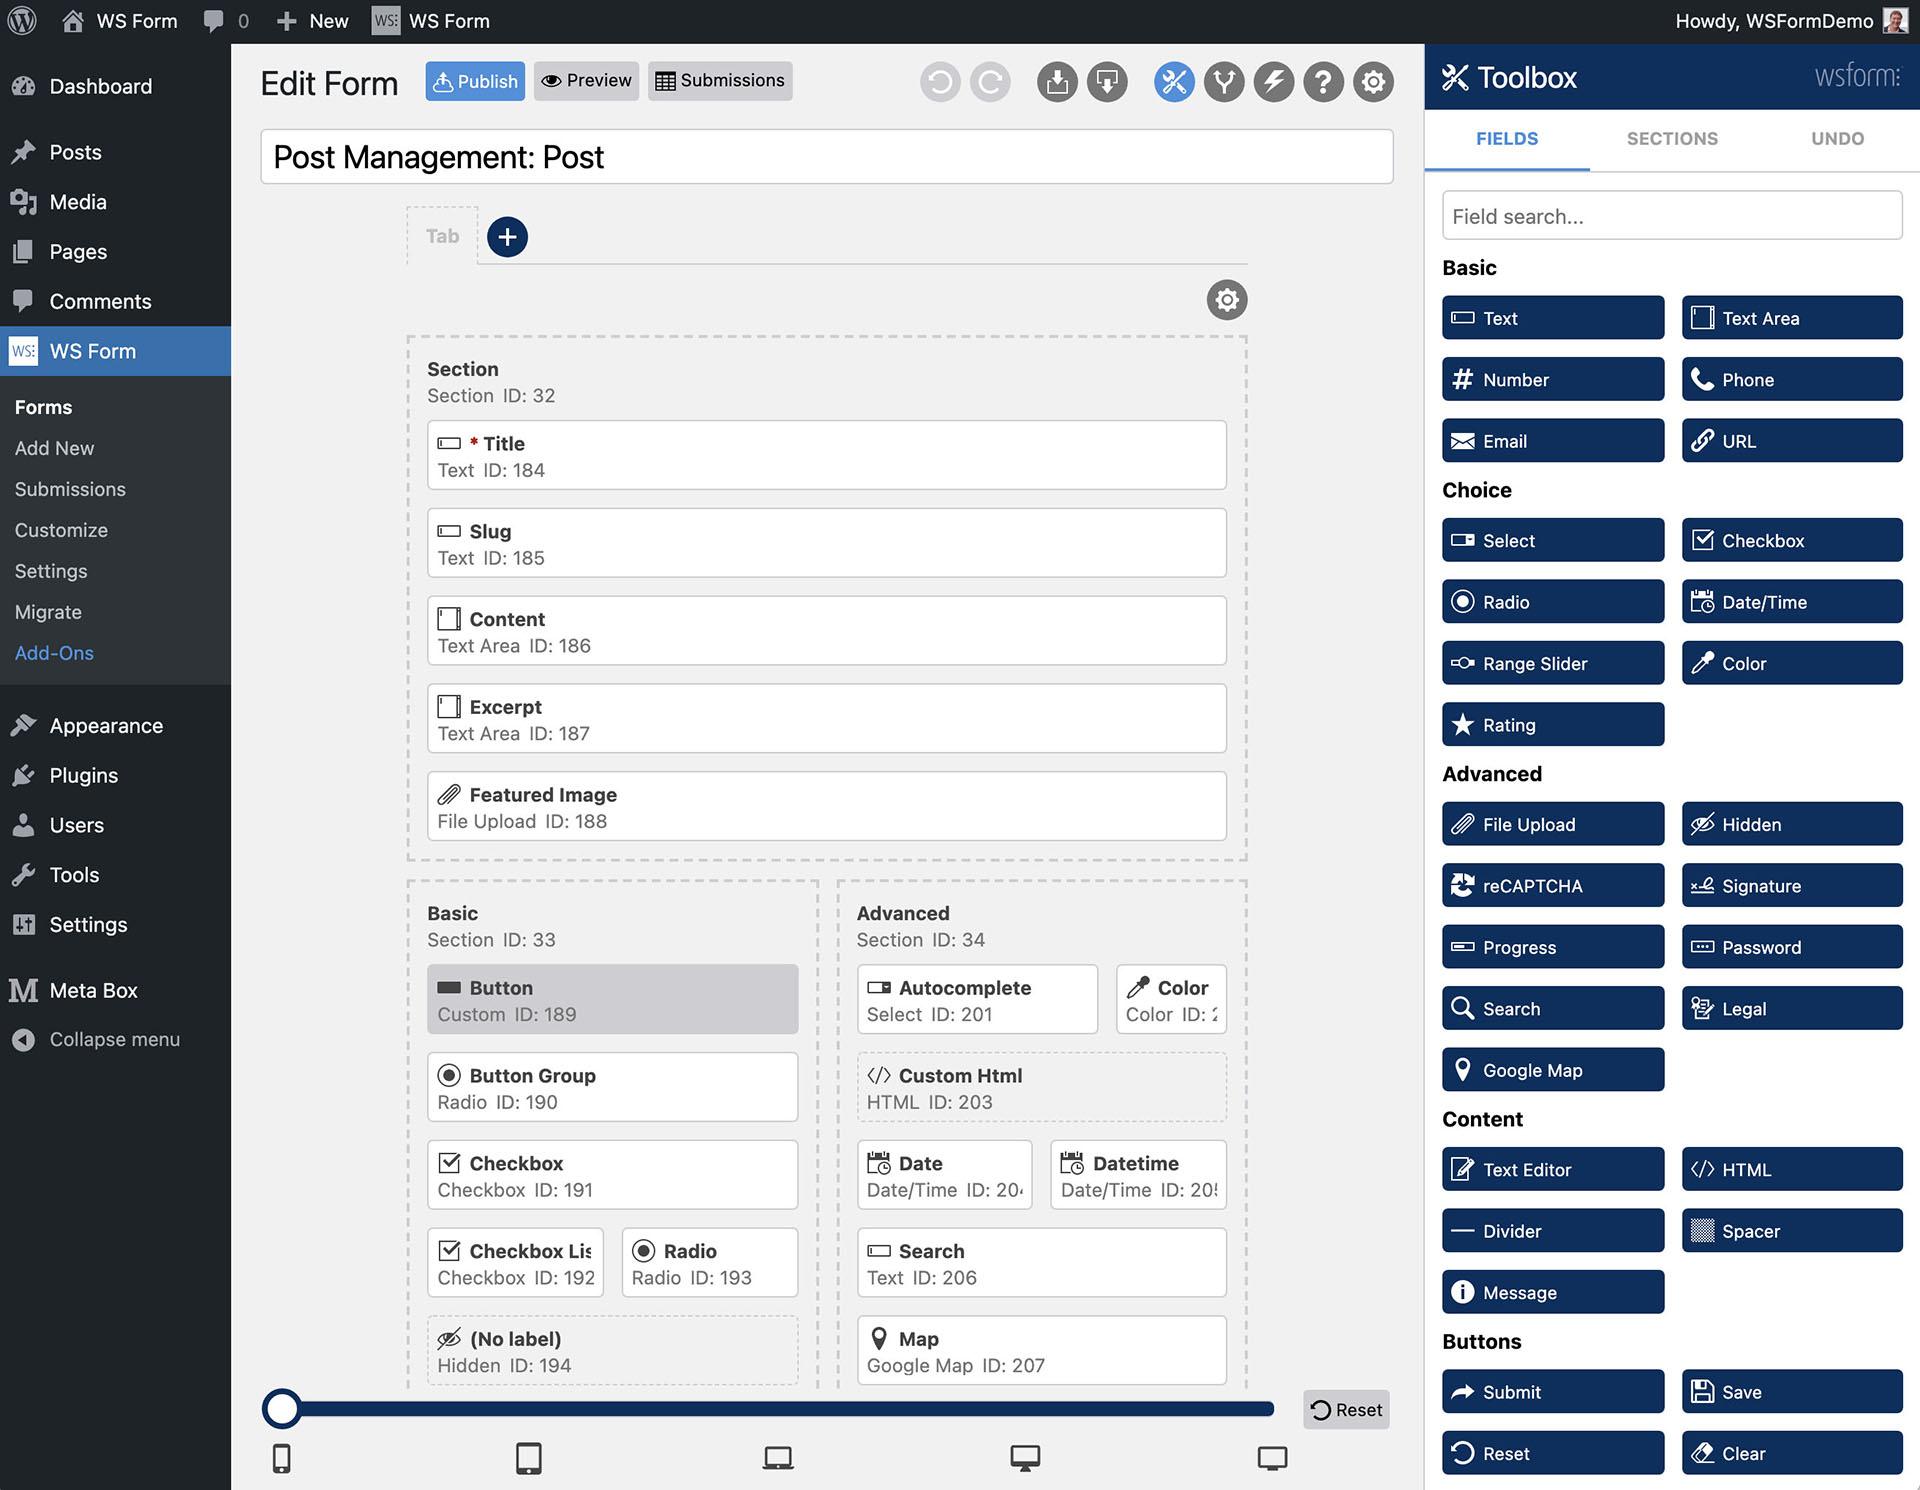 WS Form Meta Box Tutorial - New Form